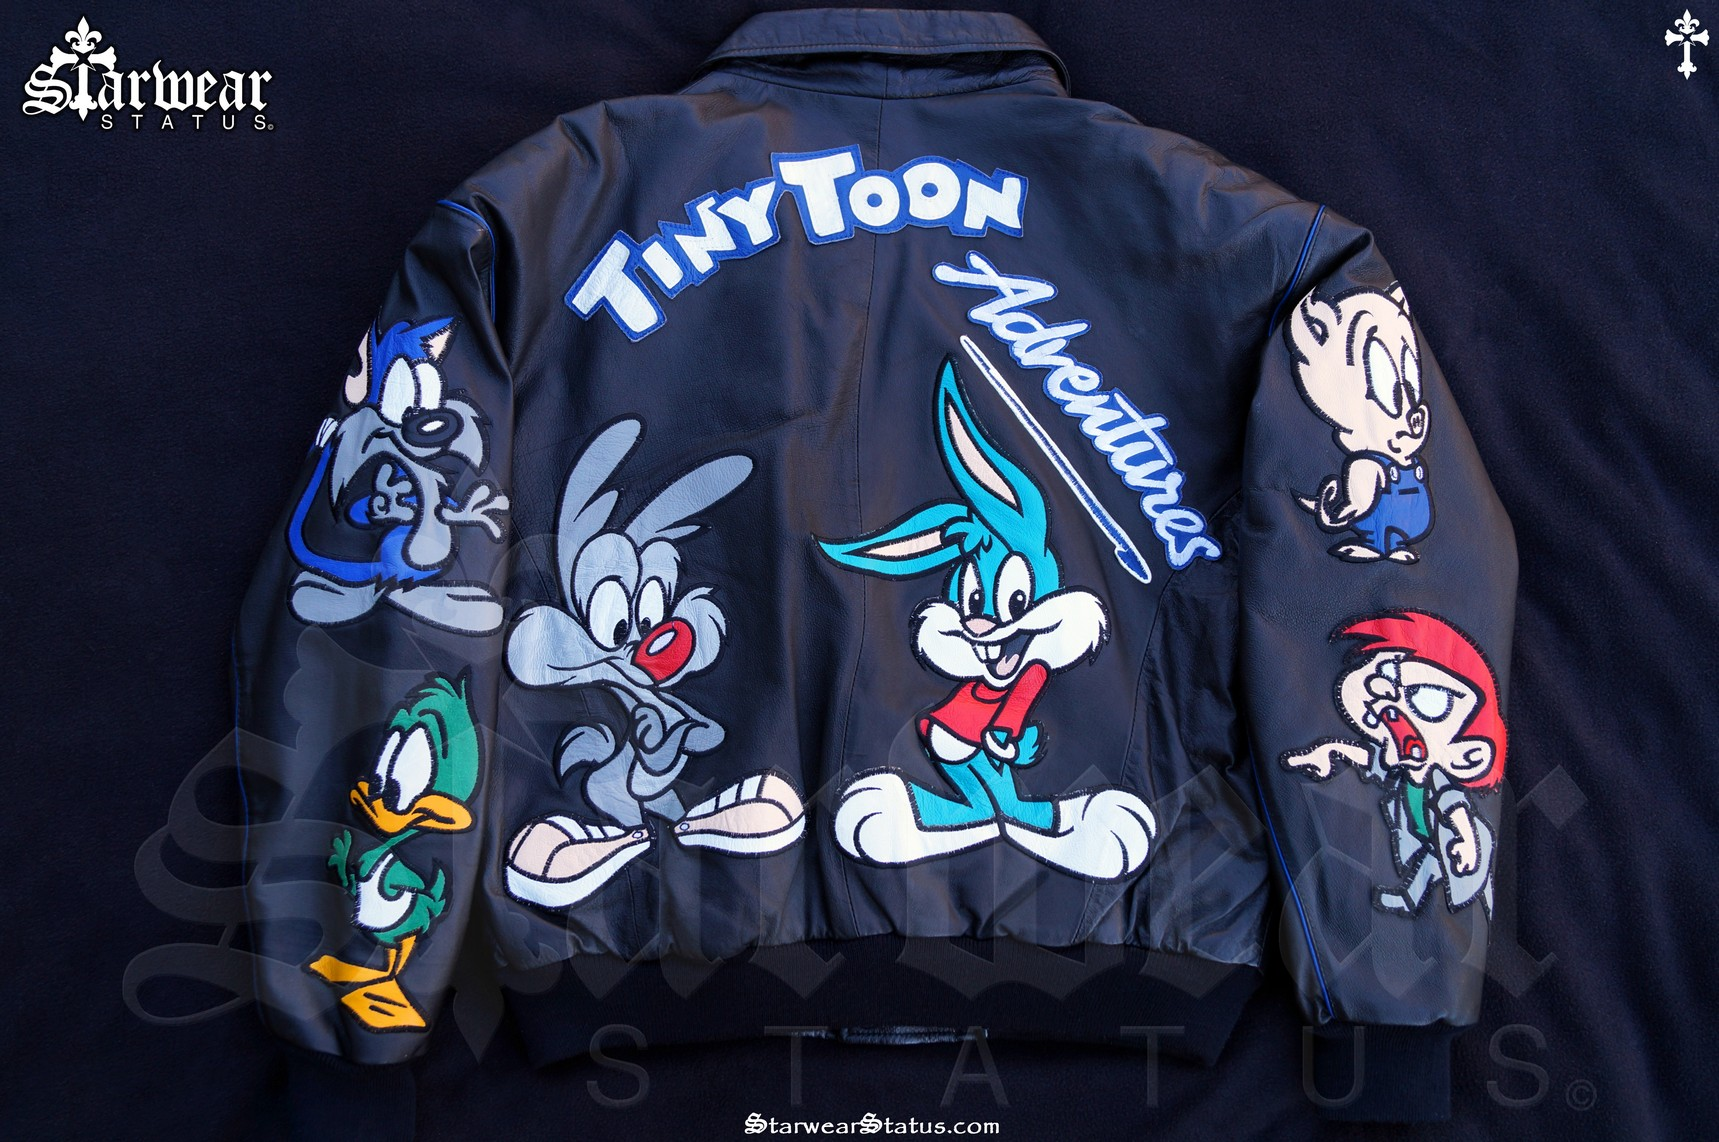 c34e8715c TINY TOONS Cartoon Leather Vintage Looney Tunes Jeff Hamilton Style Jacket  Men's M-L (Very Rare 1990's)